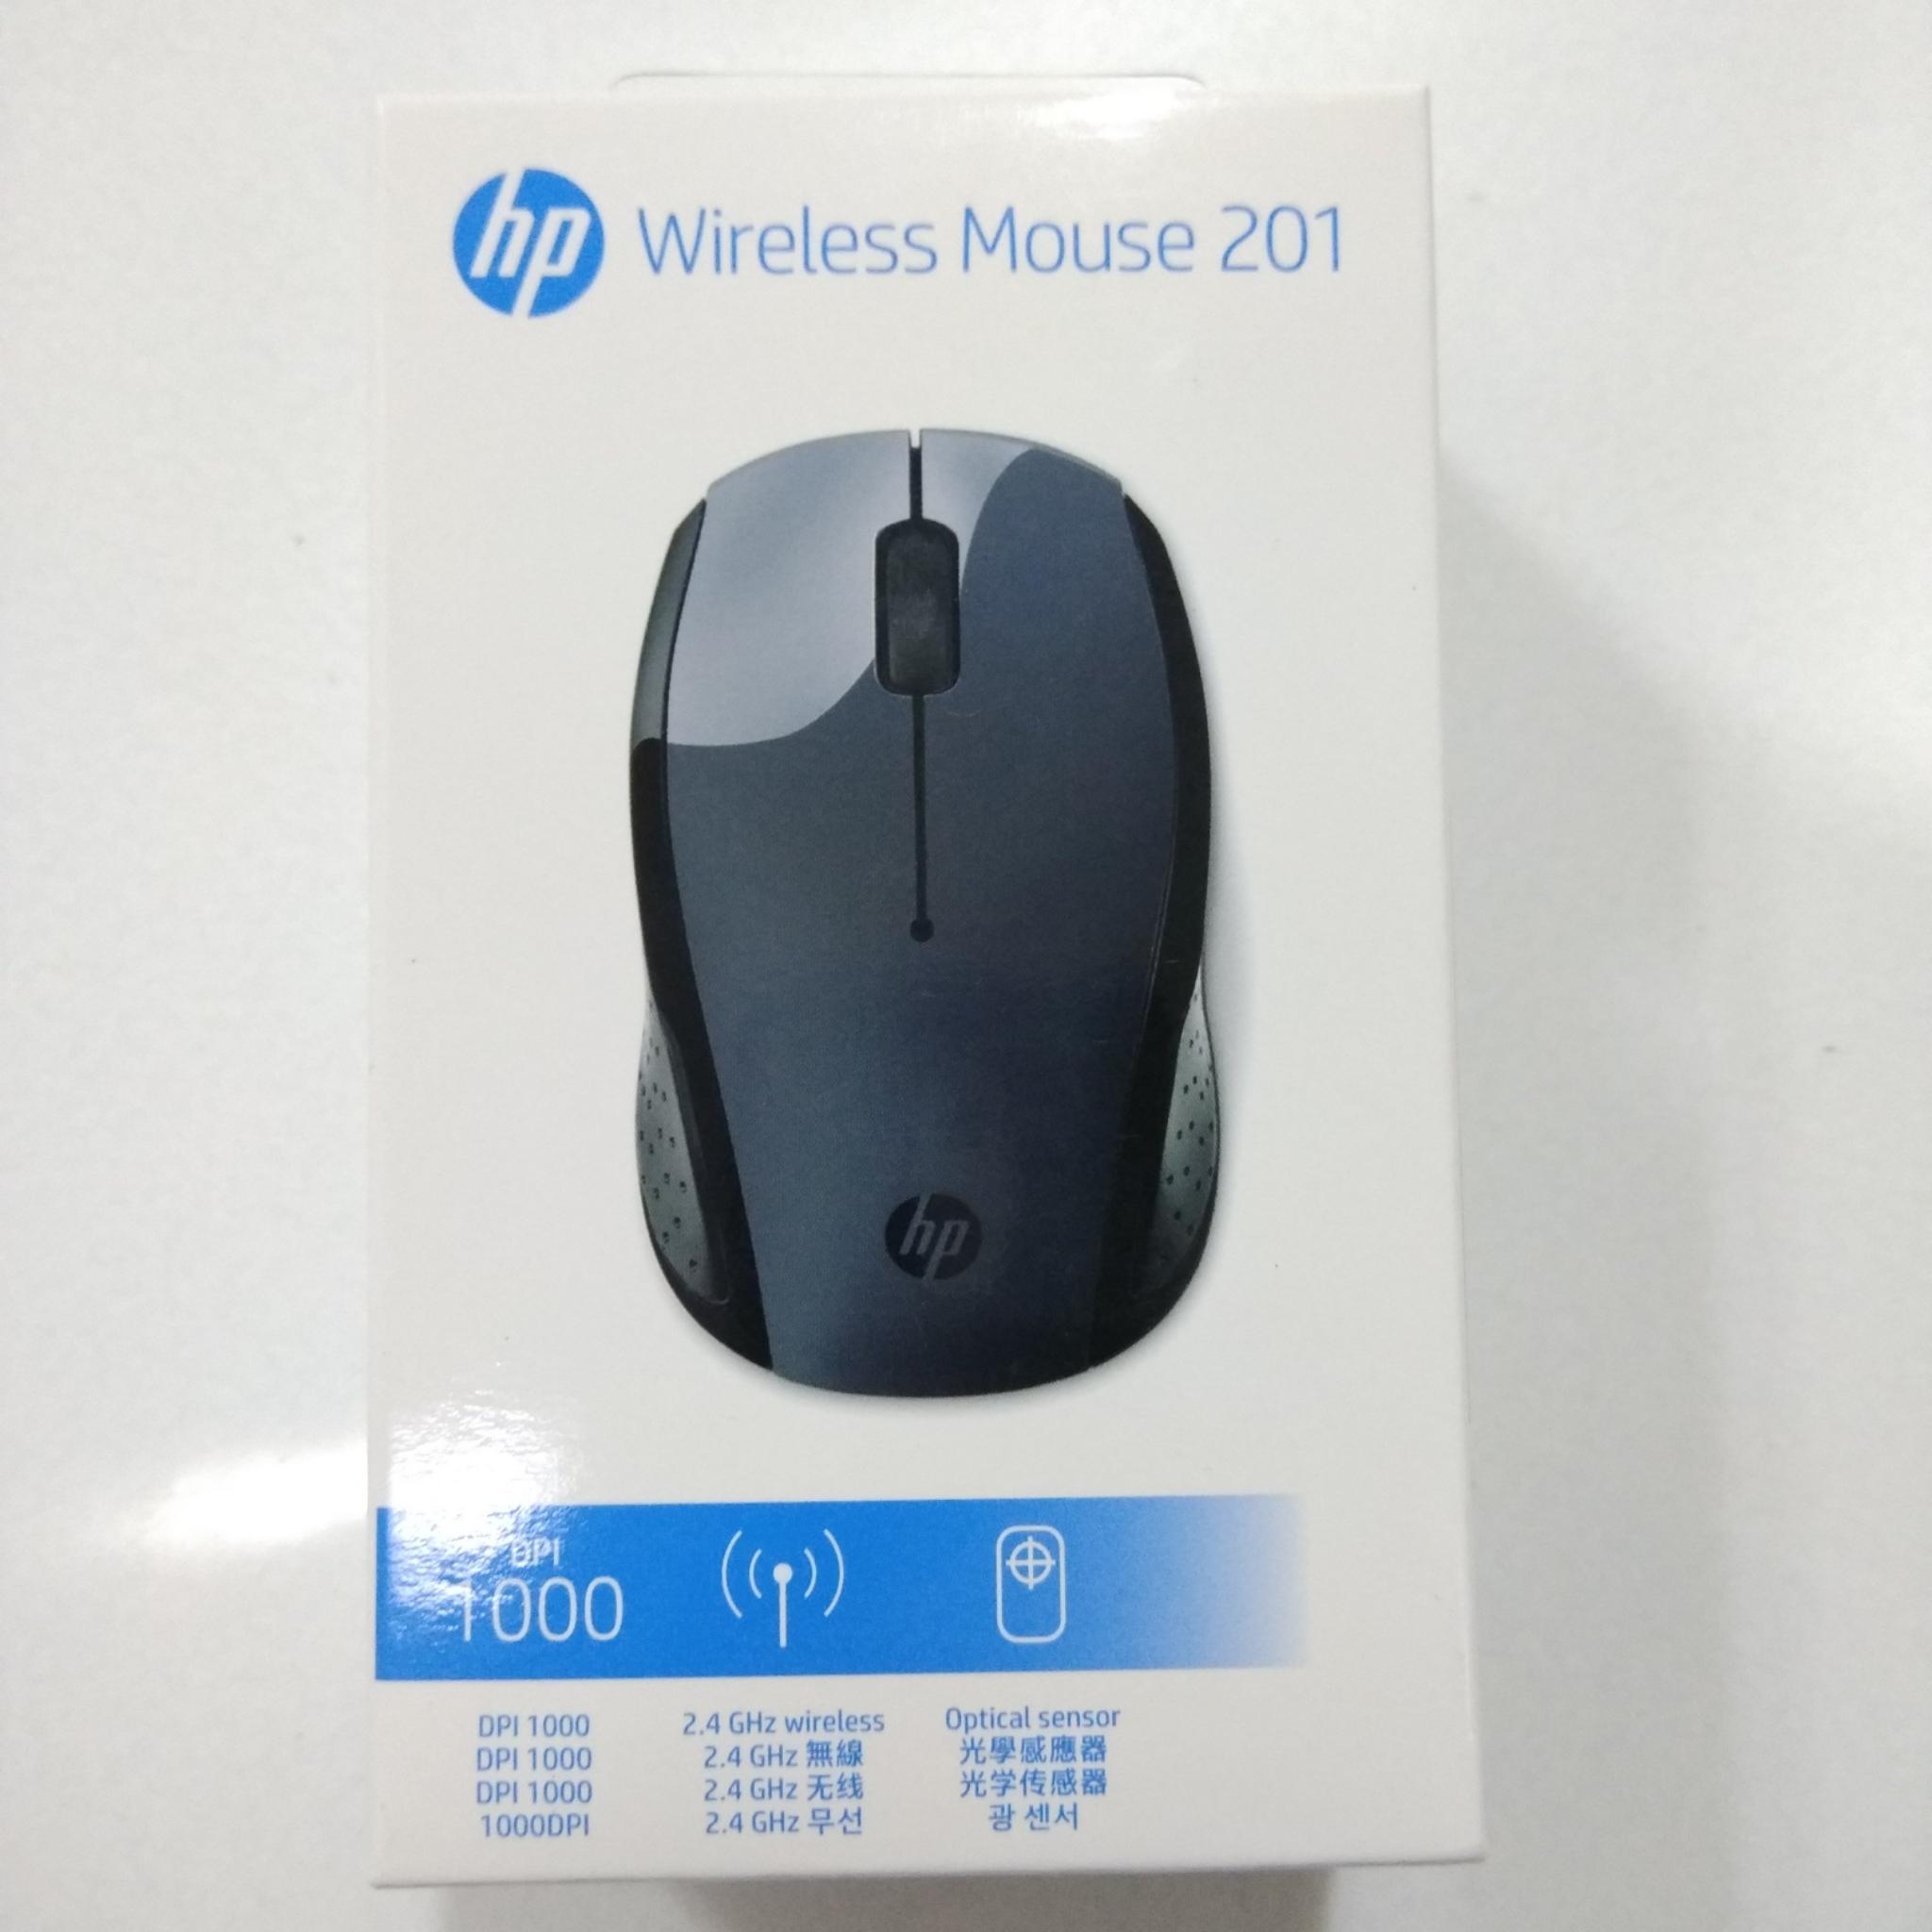 HP Wireless Mouse, 201 3XA55AA HSN:8471